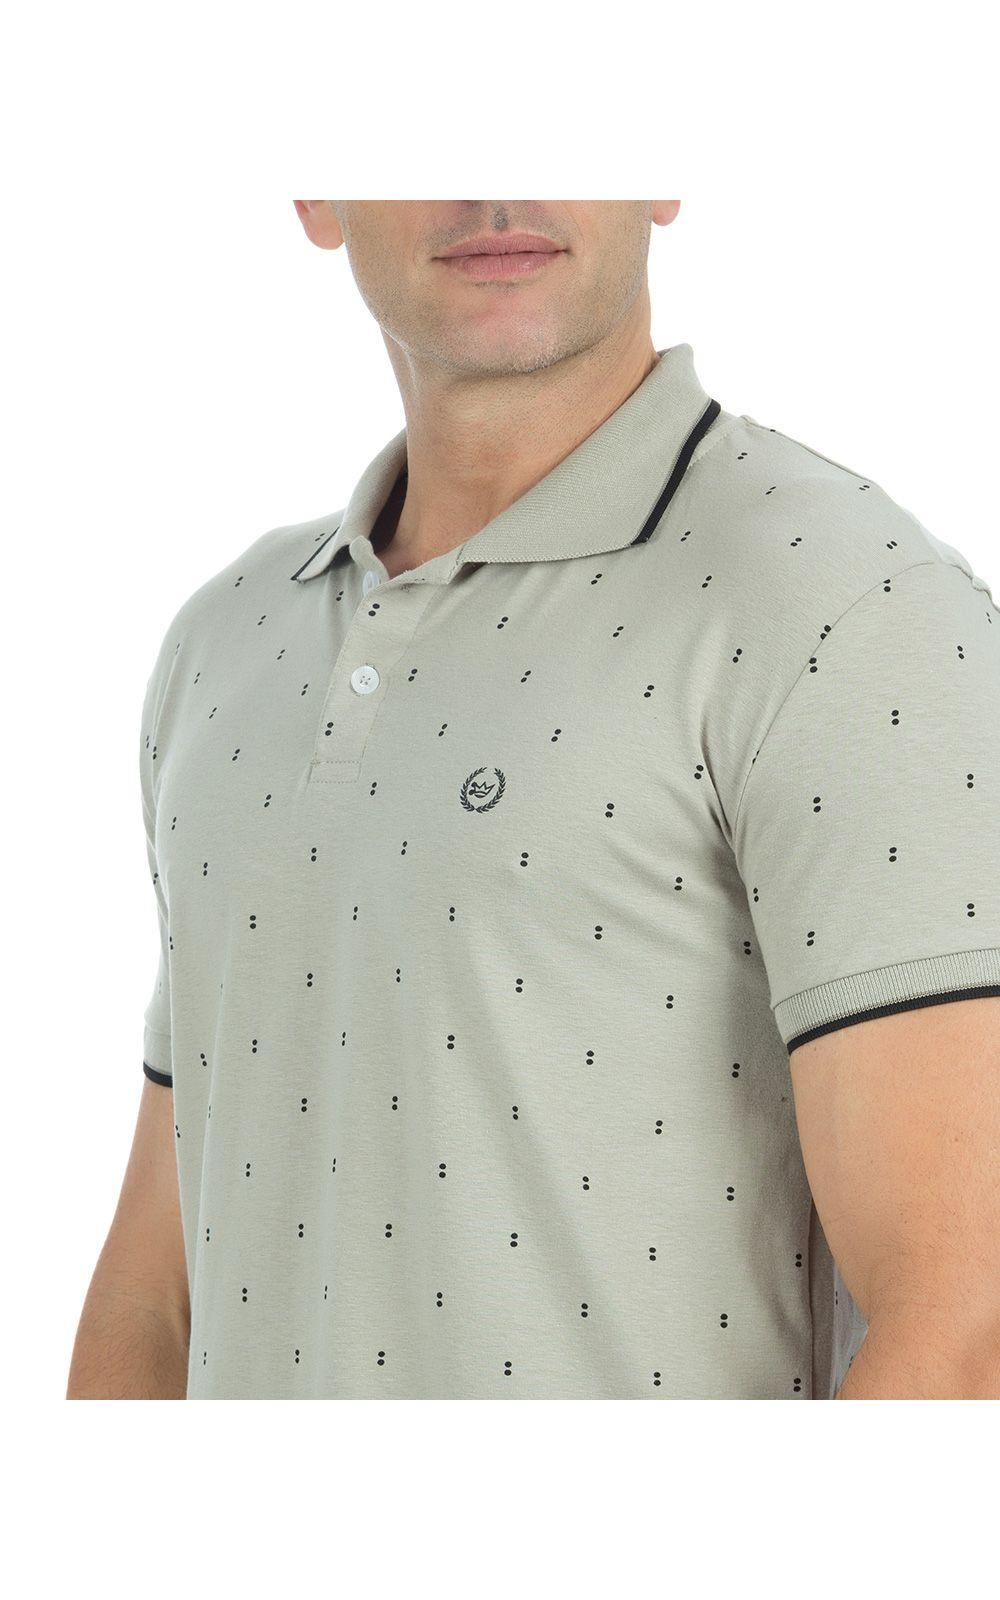 Foto 3 - Camisa Polo Masculina Cinza Estampada